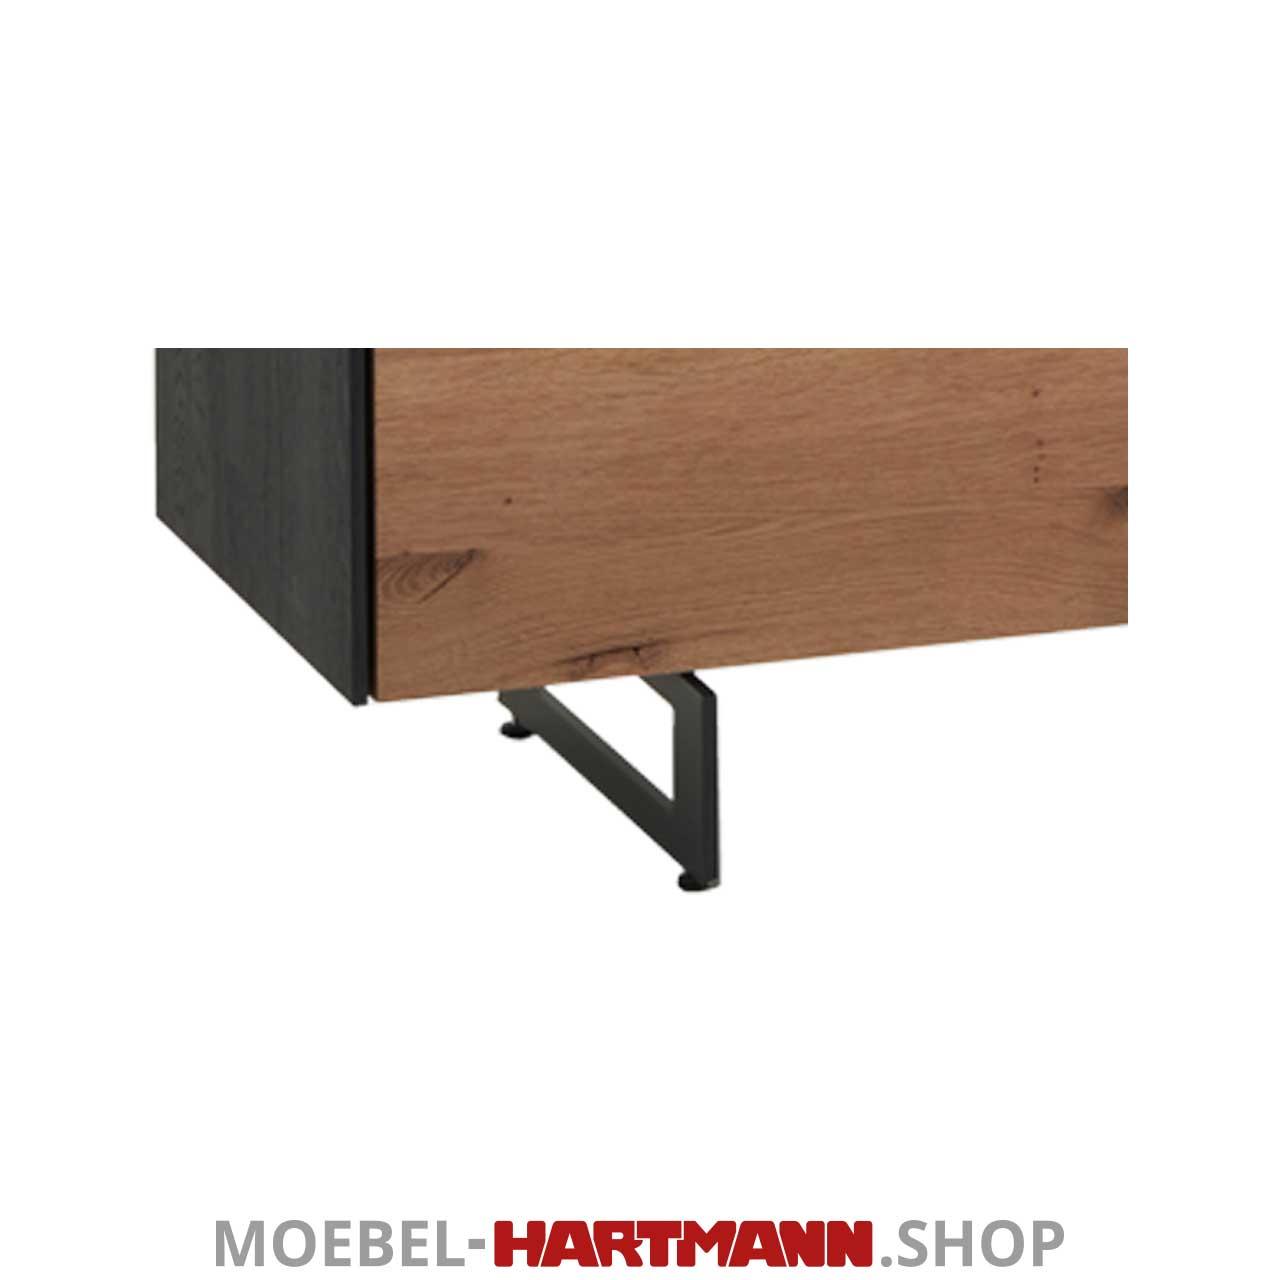 Hartmann Yoris Fusse 1045 Moebel Hartmann Shop